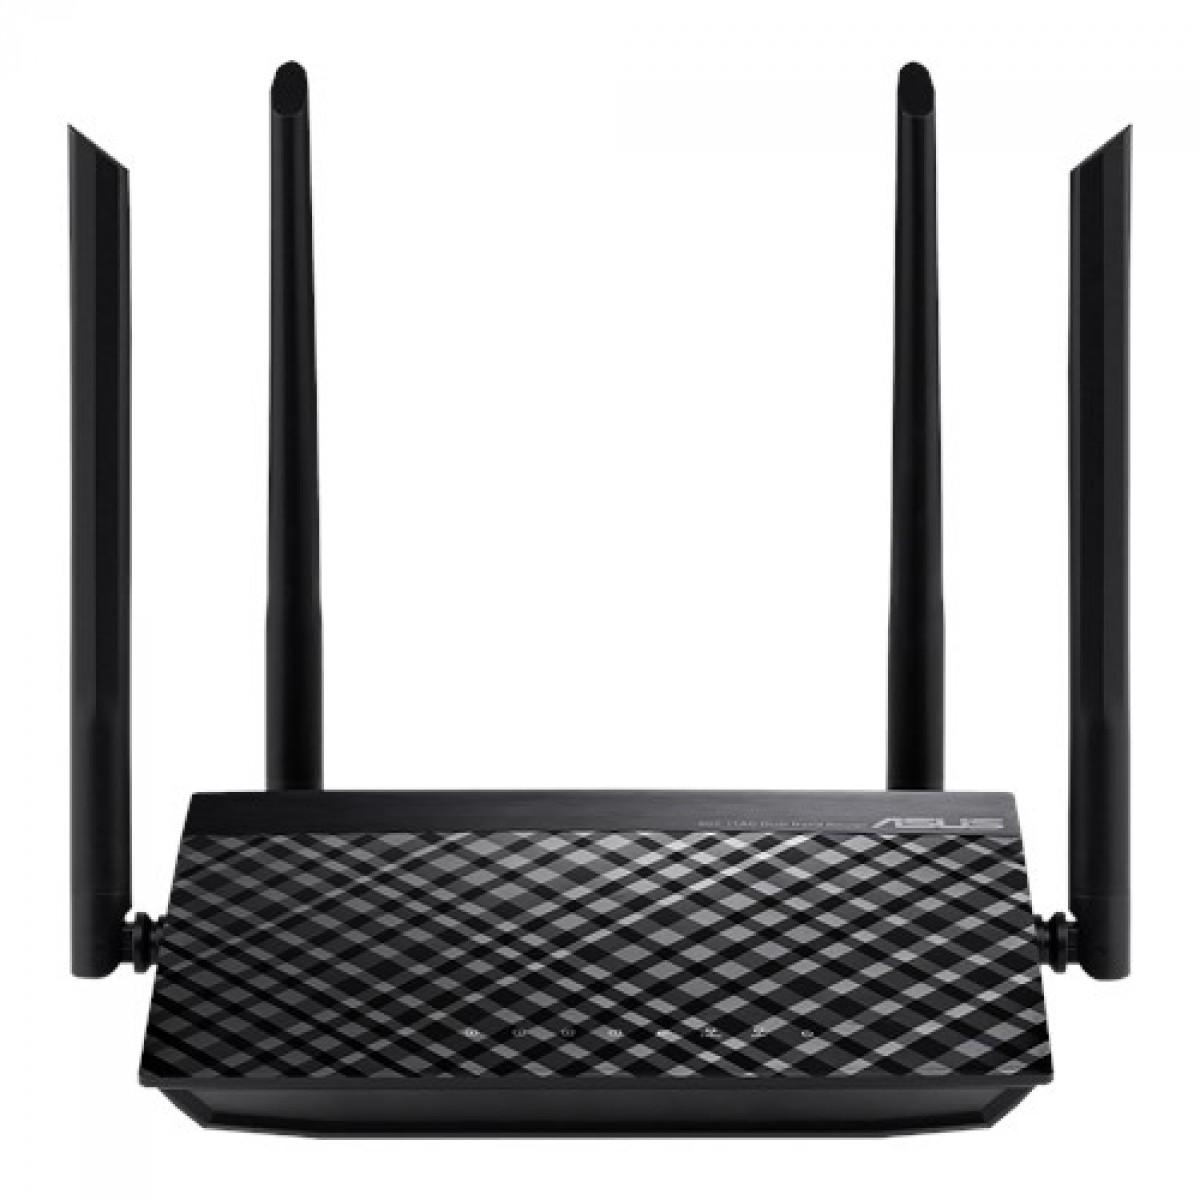 Roteador Asus, RT-AC59U, Wireless, AC1500, 5G, 4K, MU-MIMO, 90IG0540-BY8400